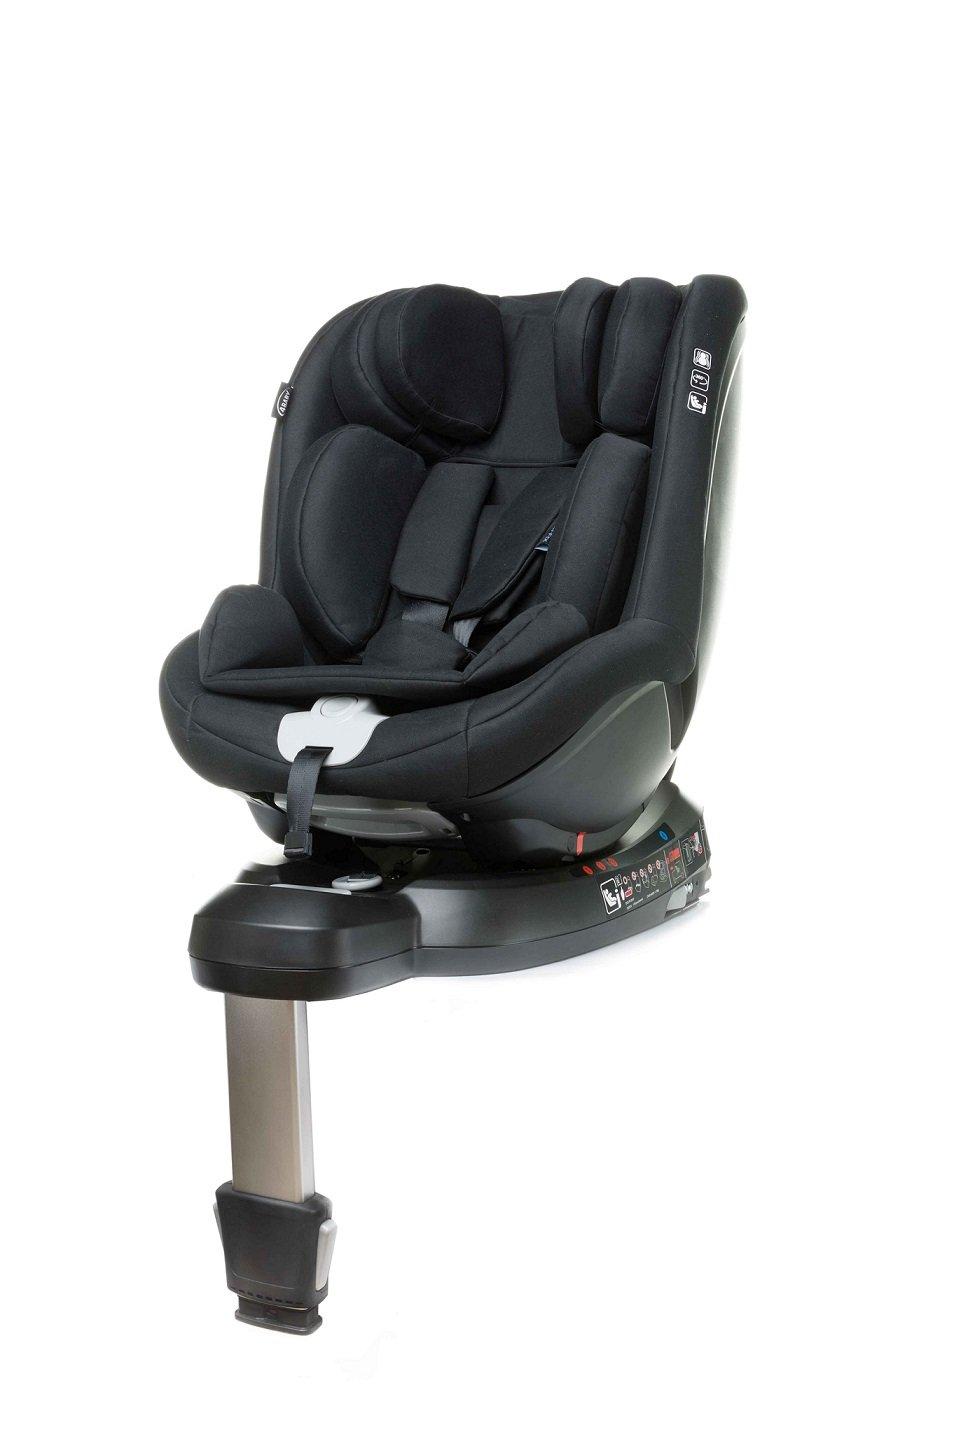 Autosedaèka NANO-FIX 360° 0-18 kg